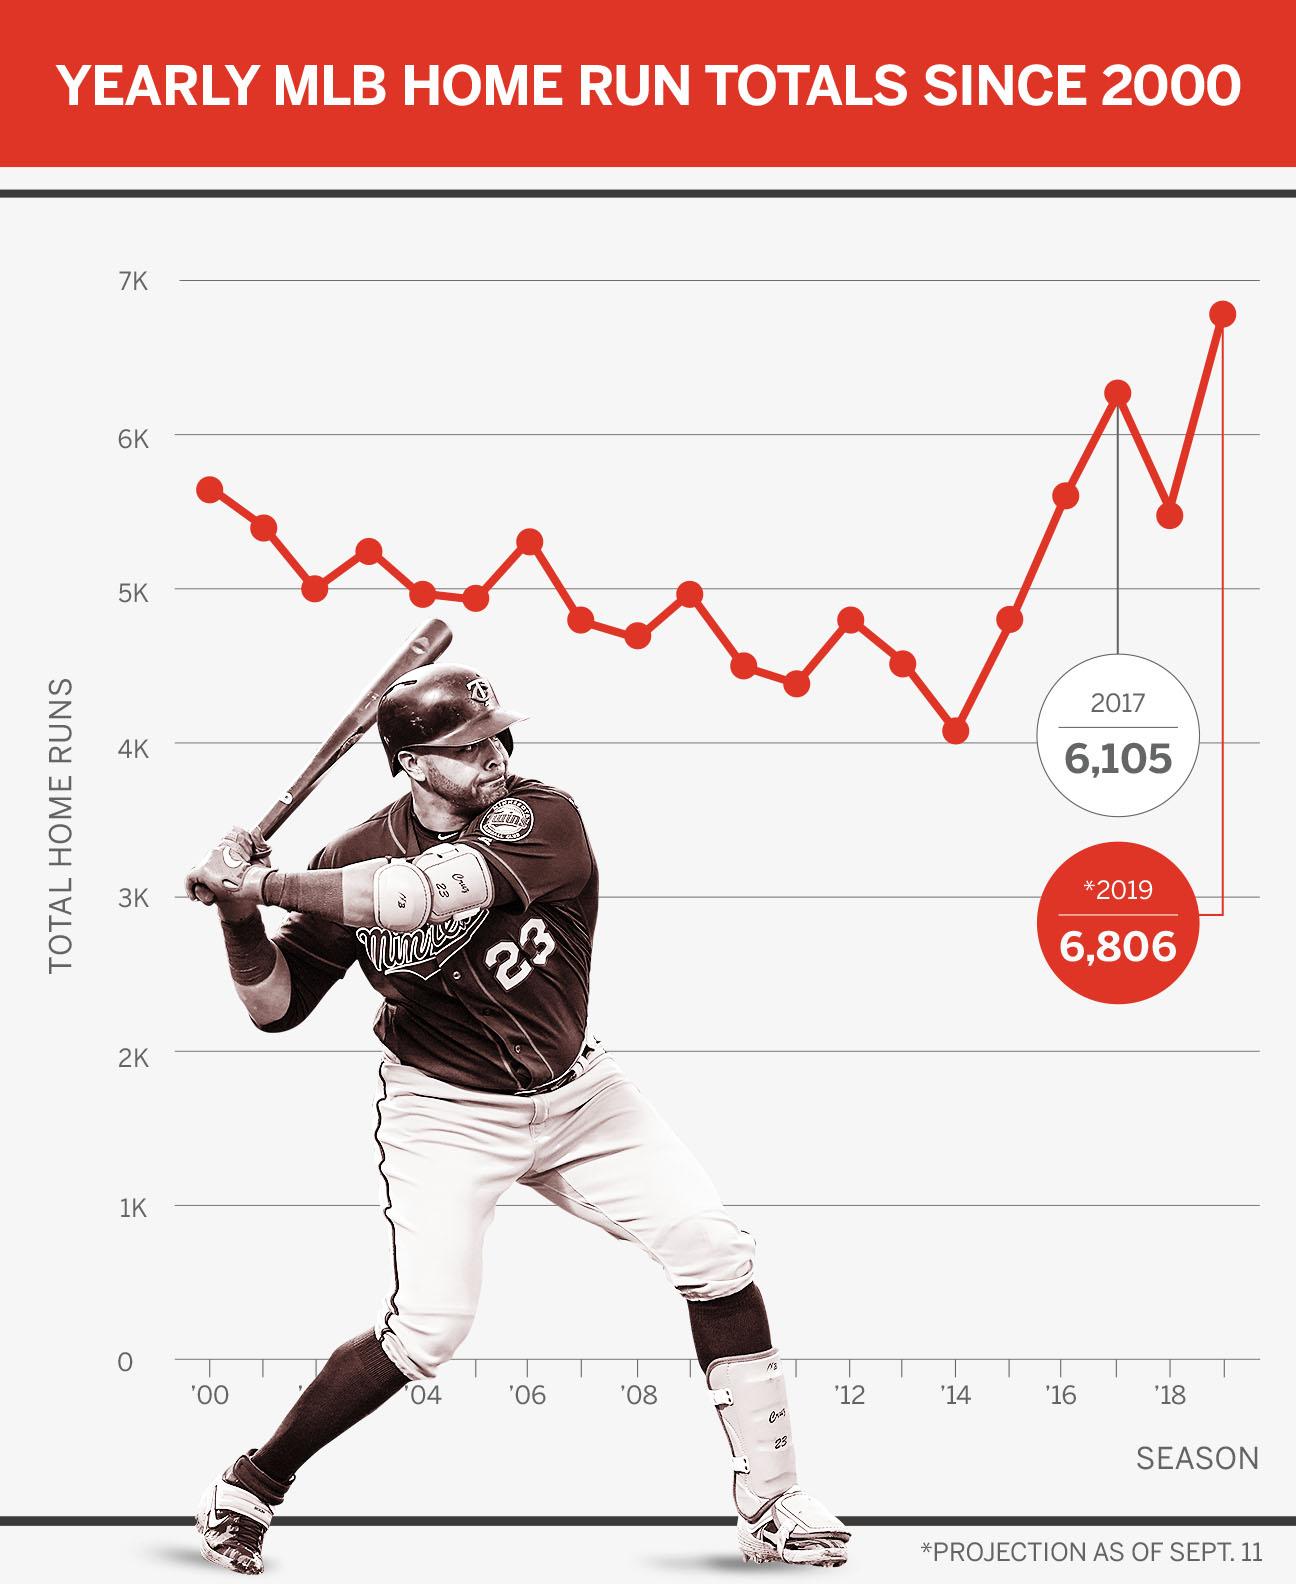 2020 Mlb Home Run Leaders.Going Going Gone Inside Mlb S New Home Run Record